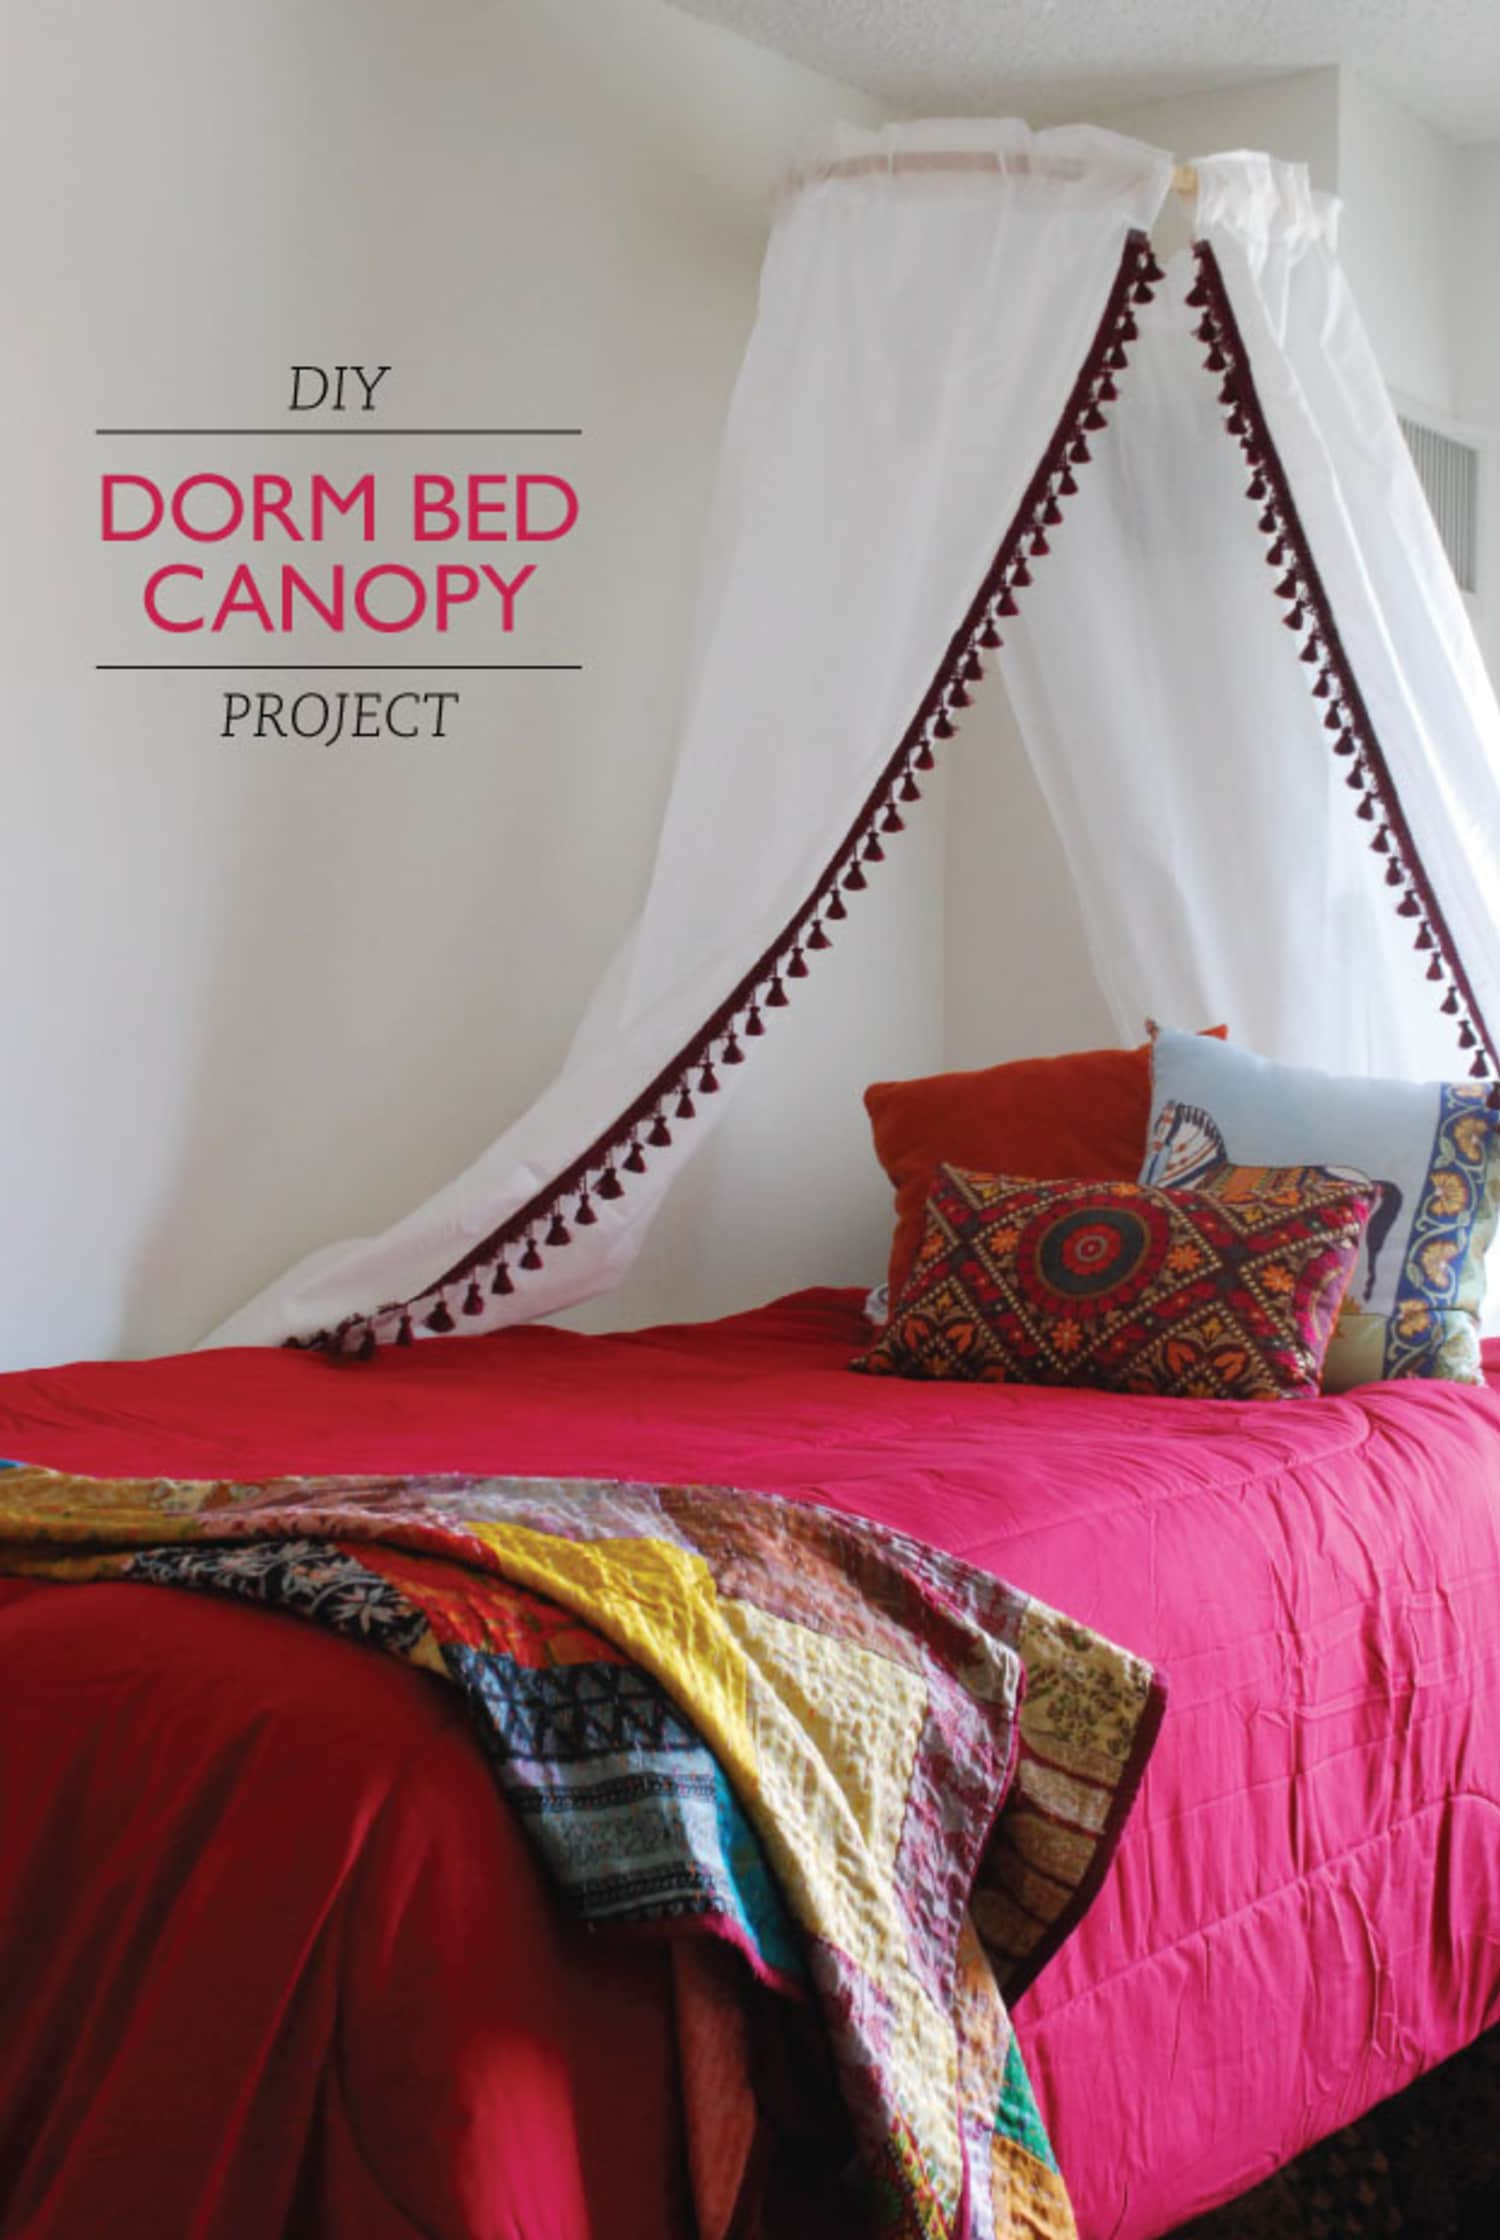 ikea bed canopy instructions